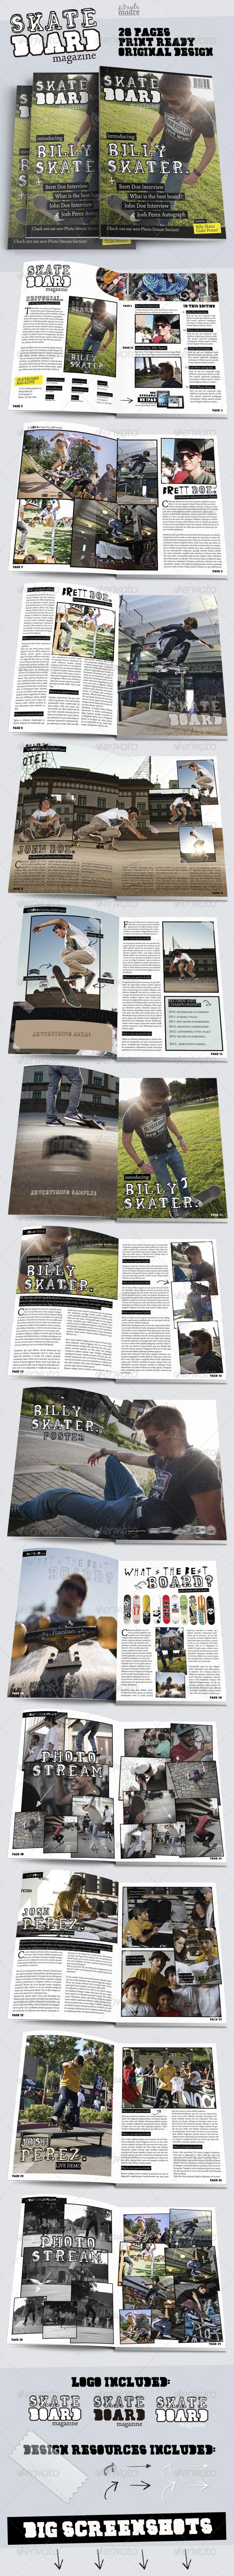 Skateboard Magazine Template - Magazines Print Templates